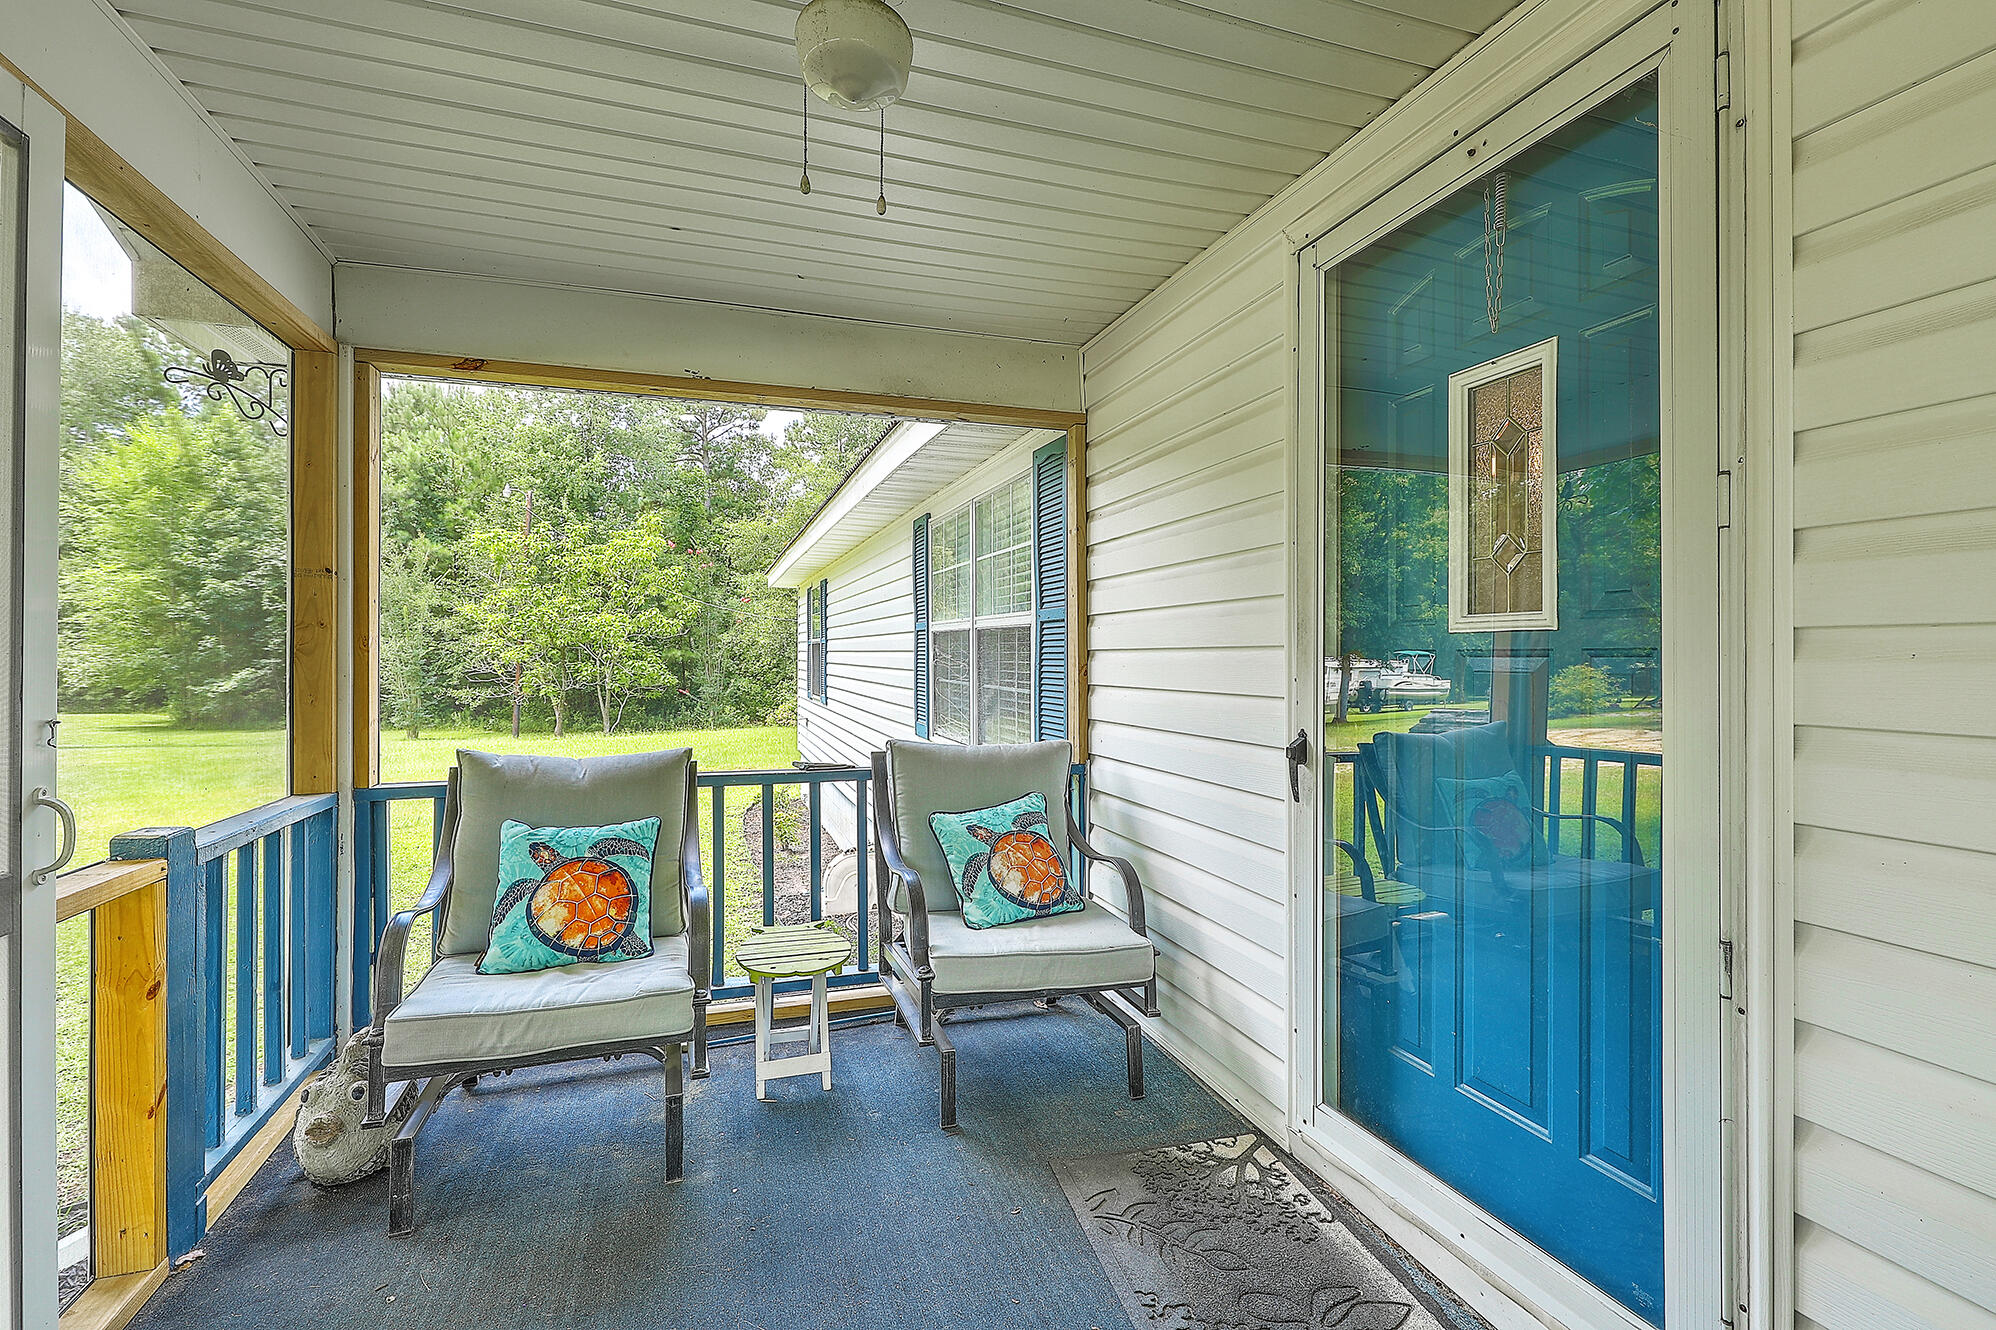 Cross Area (West) Homes For Sale - 128 Cherry Grove, Cross, SC - 27